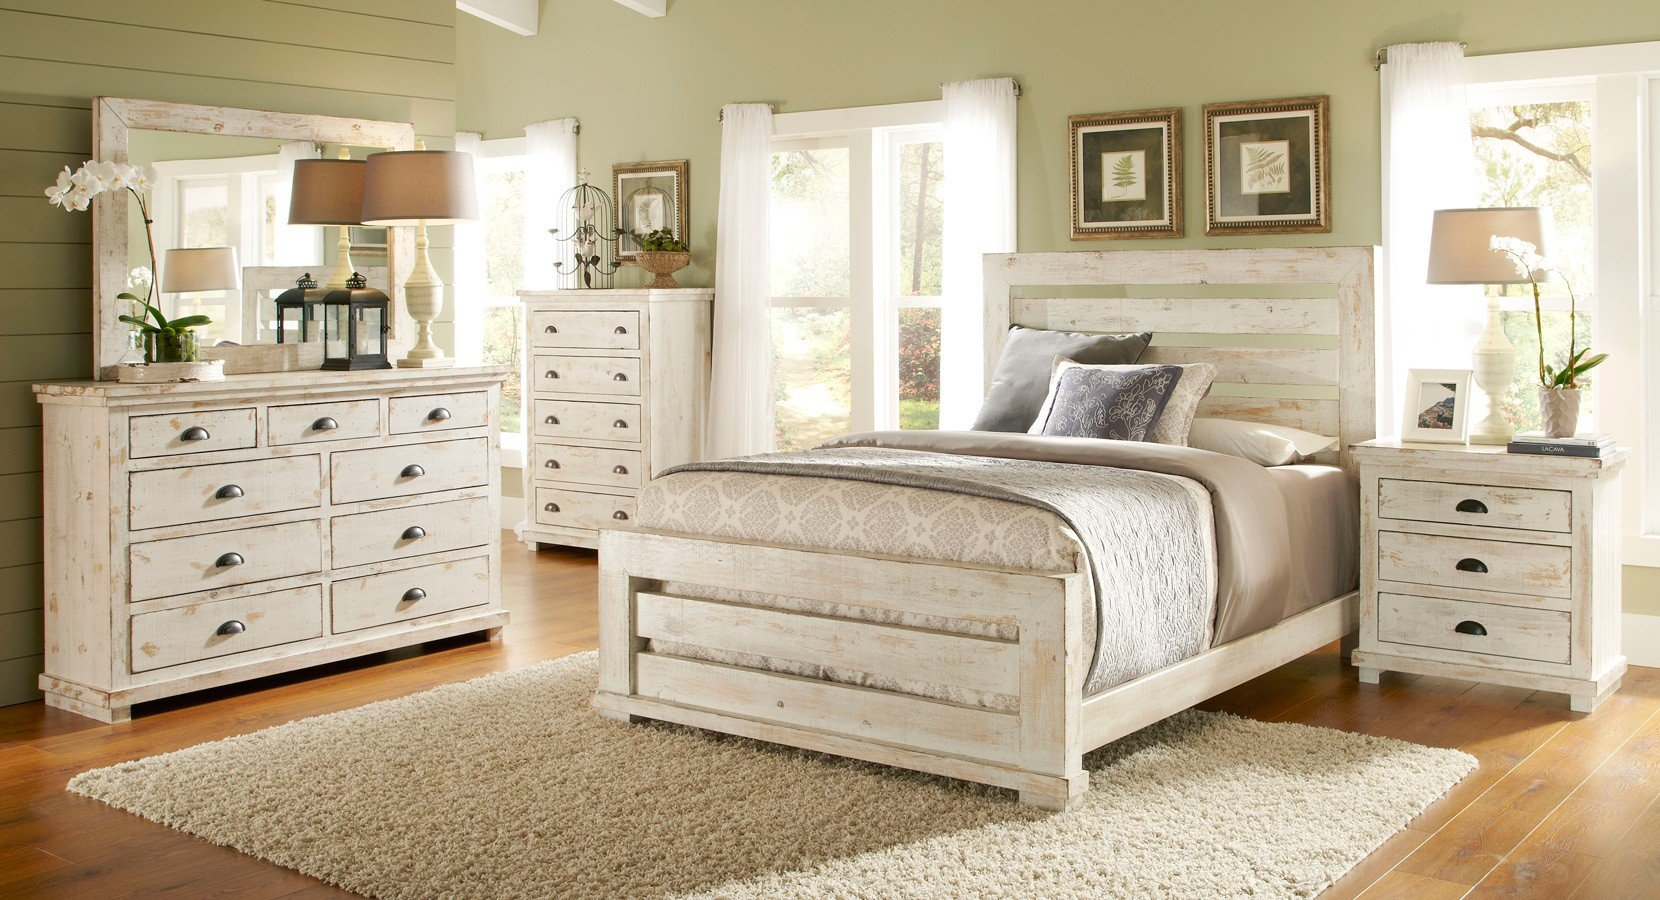 Willow Slat Bedroom Set Distressed White Progressive Furniture 14 Reviews Furniture Cart